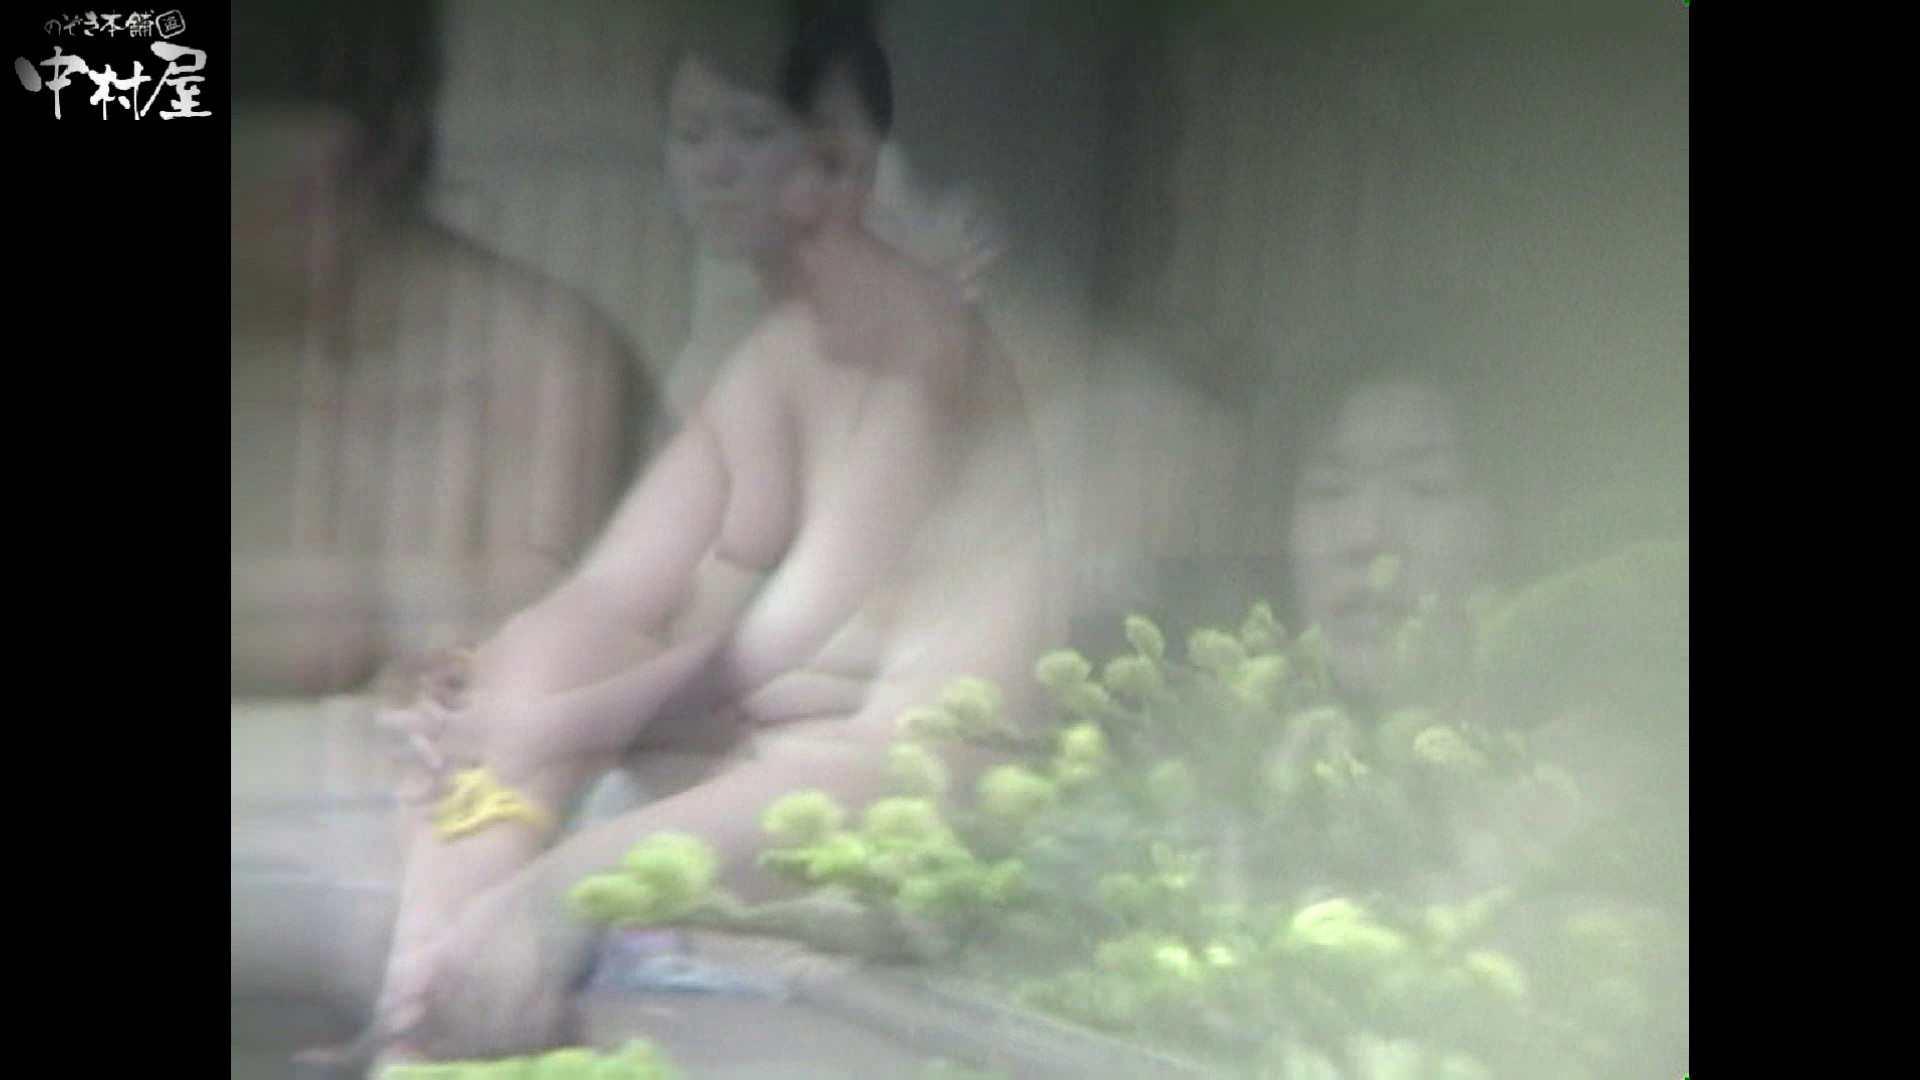 Aquaな露天風呂Vol.935 露天 | OLセックス  106画像 28